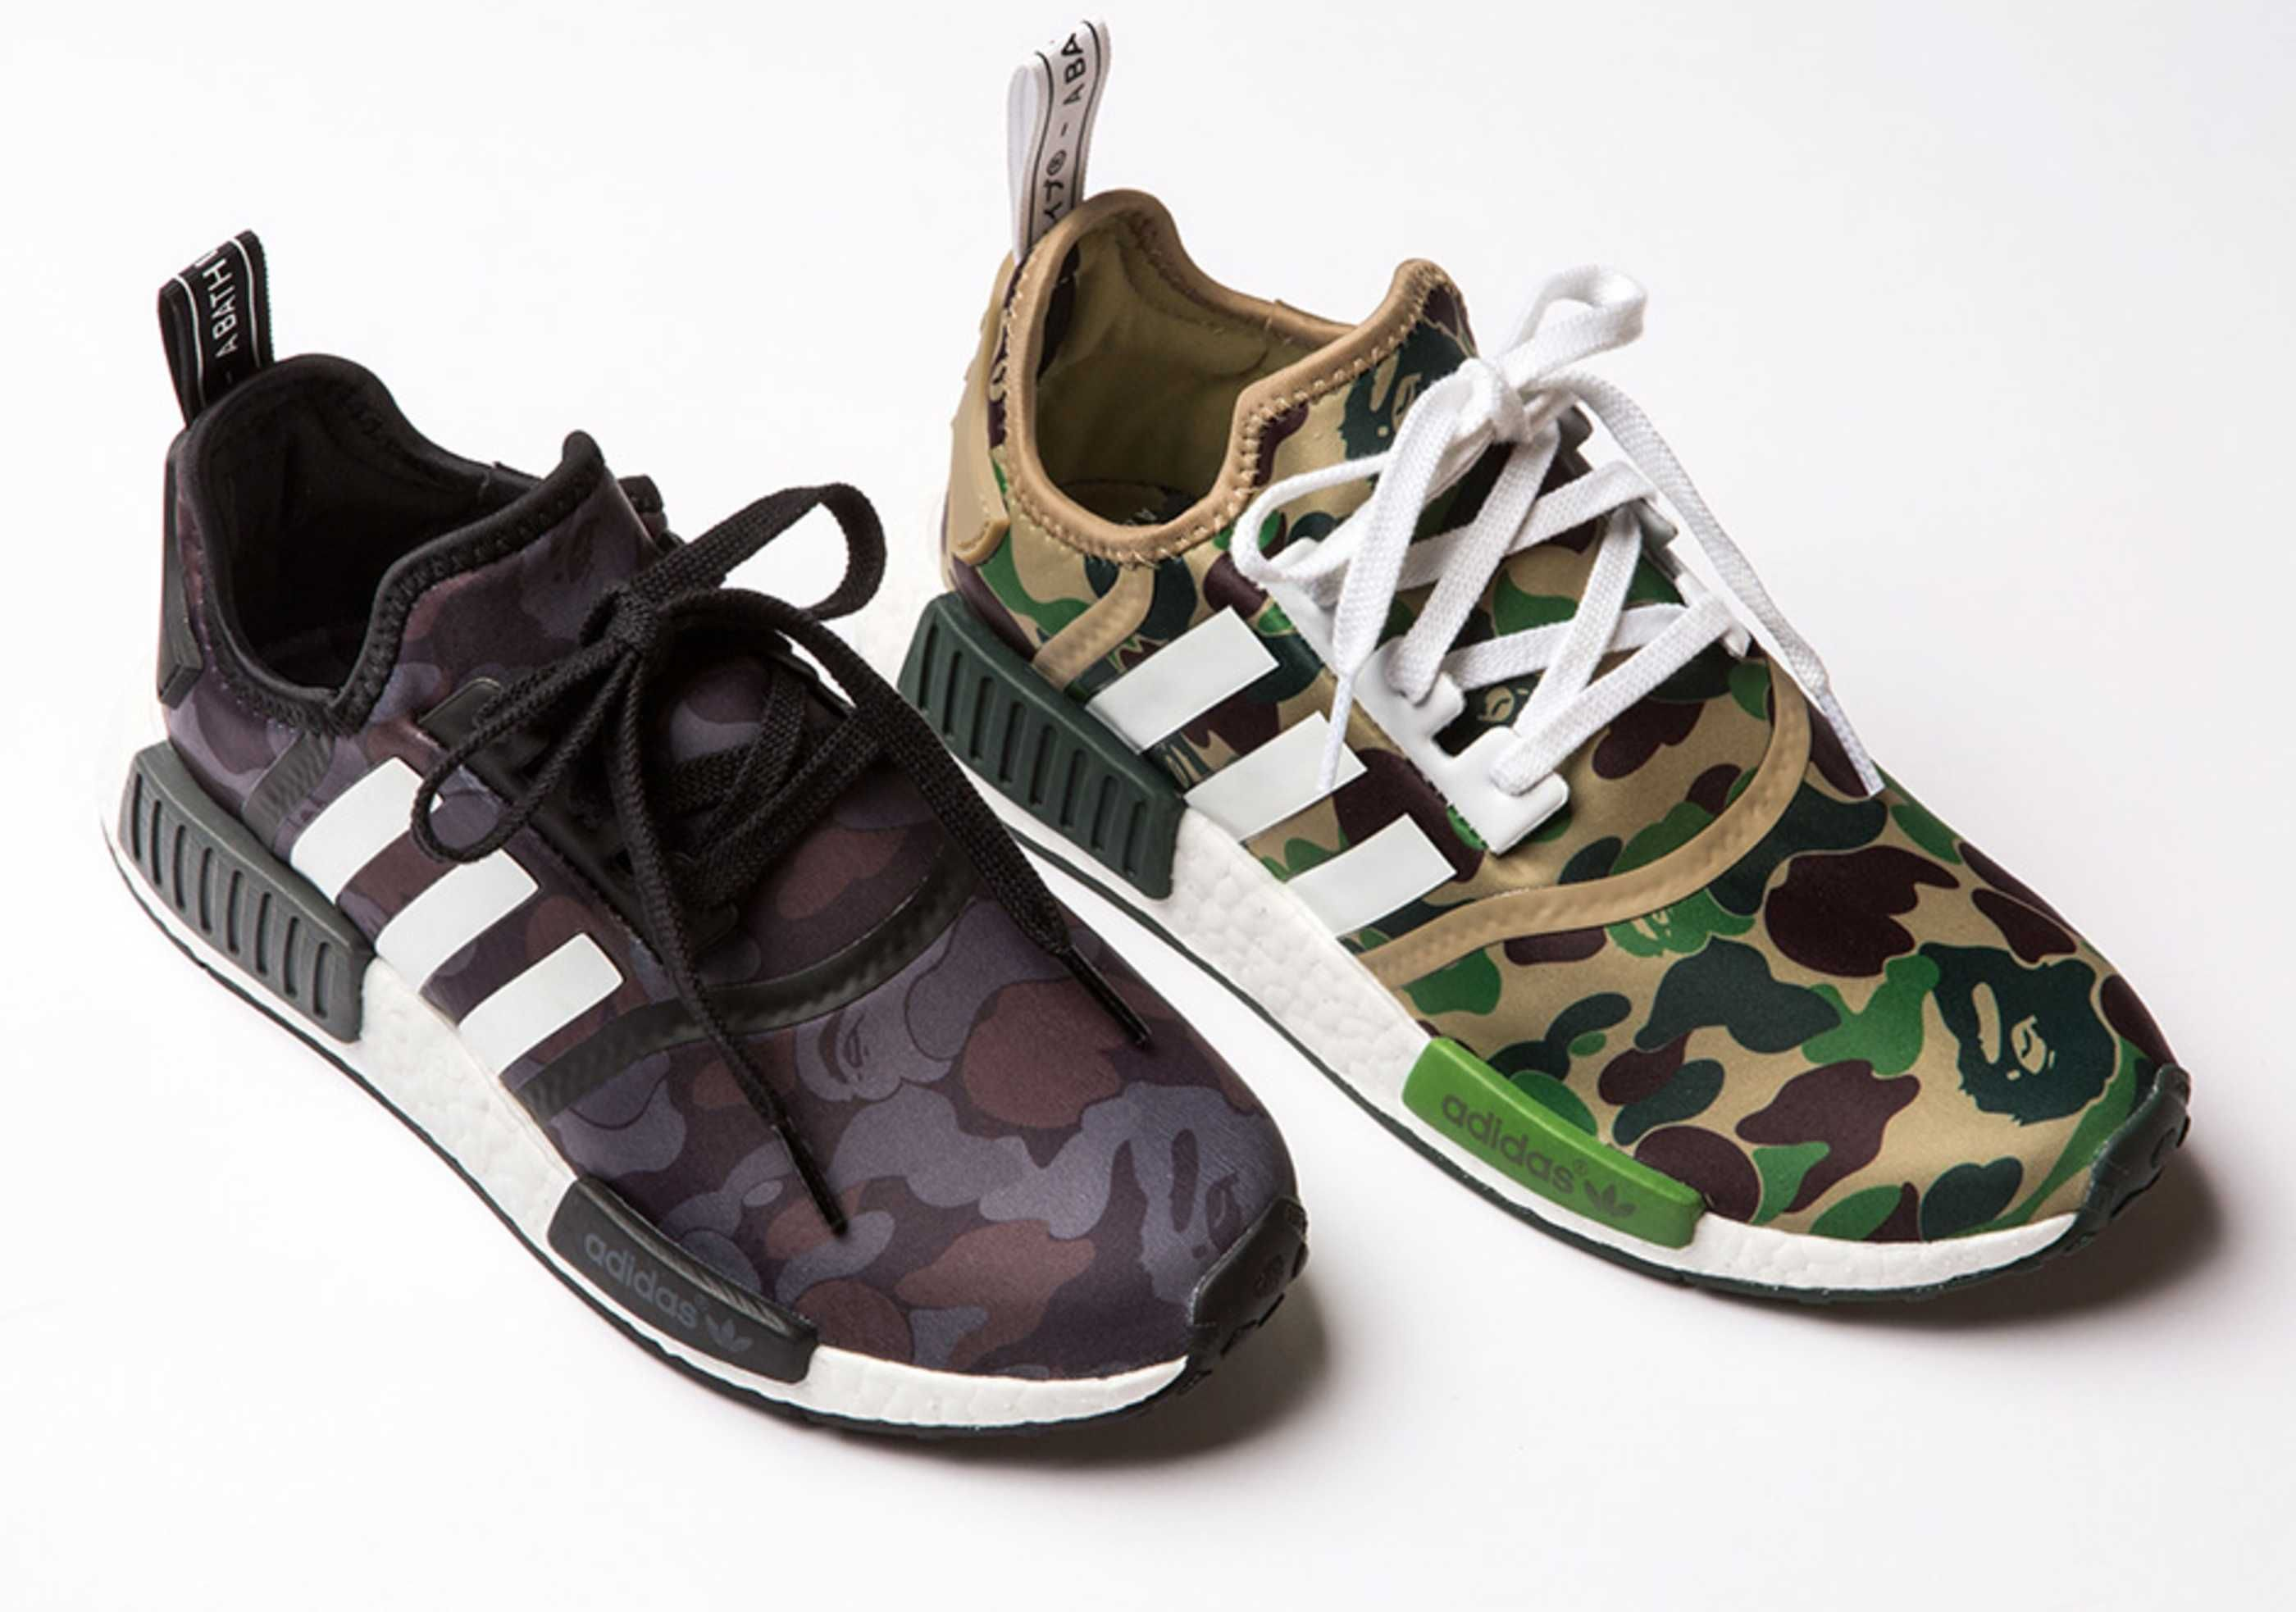 BAPE x ADIDAS NMD R1-DATA PREMIERY-4 | Sneakers | Pinterest | Adidas nmd  r1, Nmd r1 and Adidas nmd